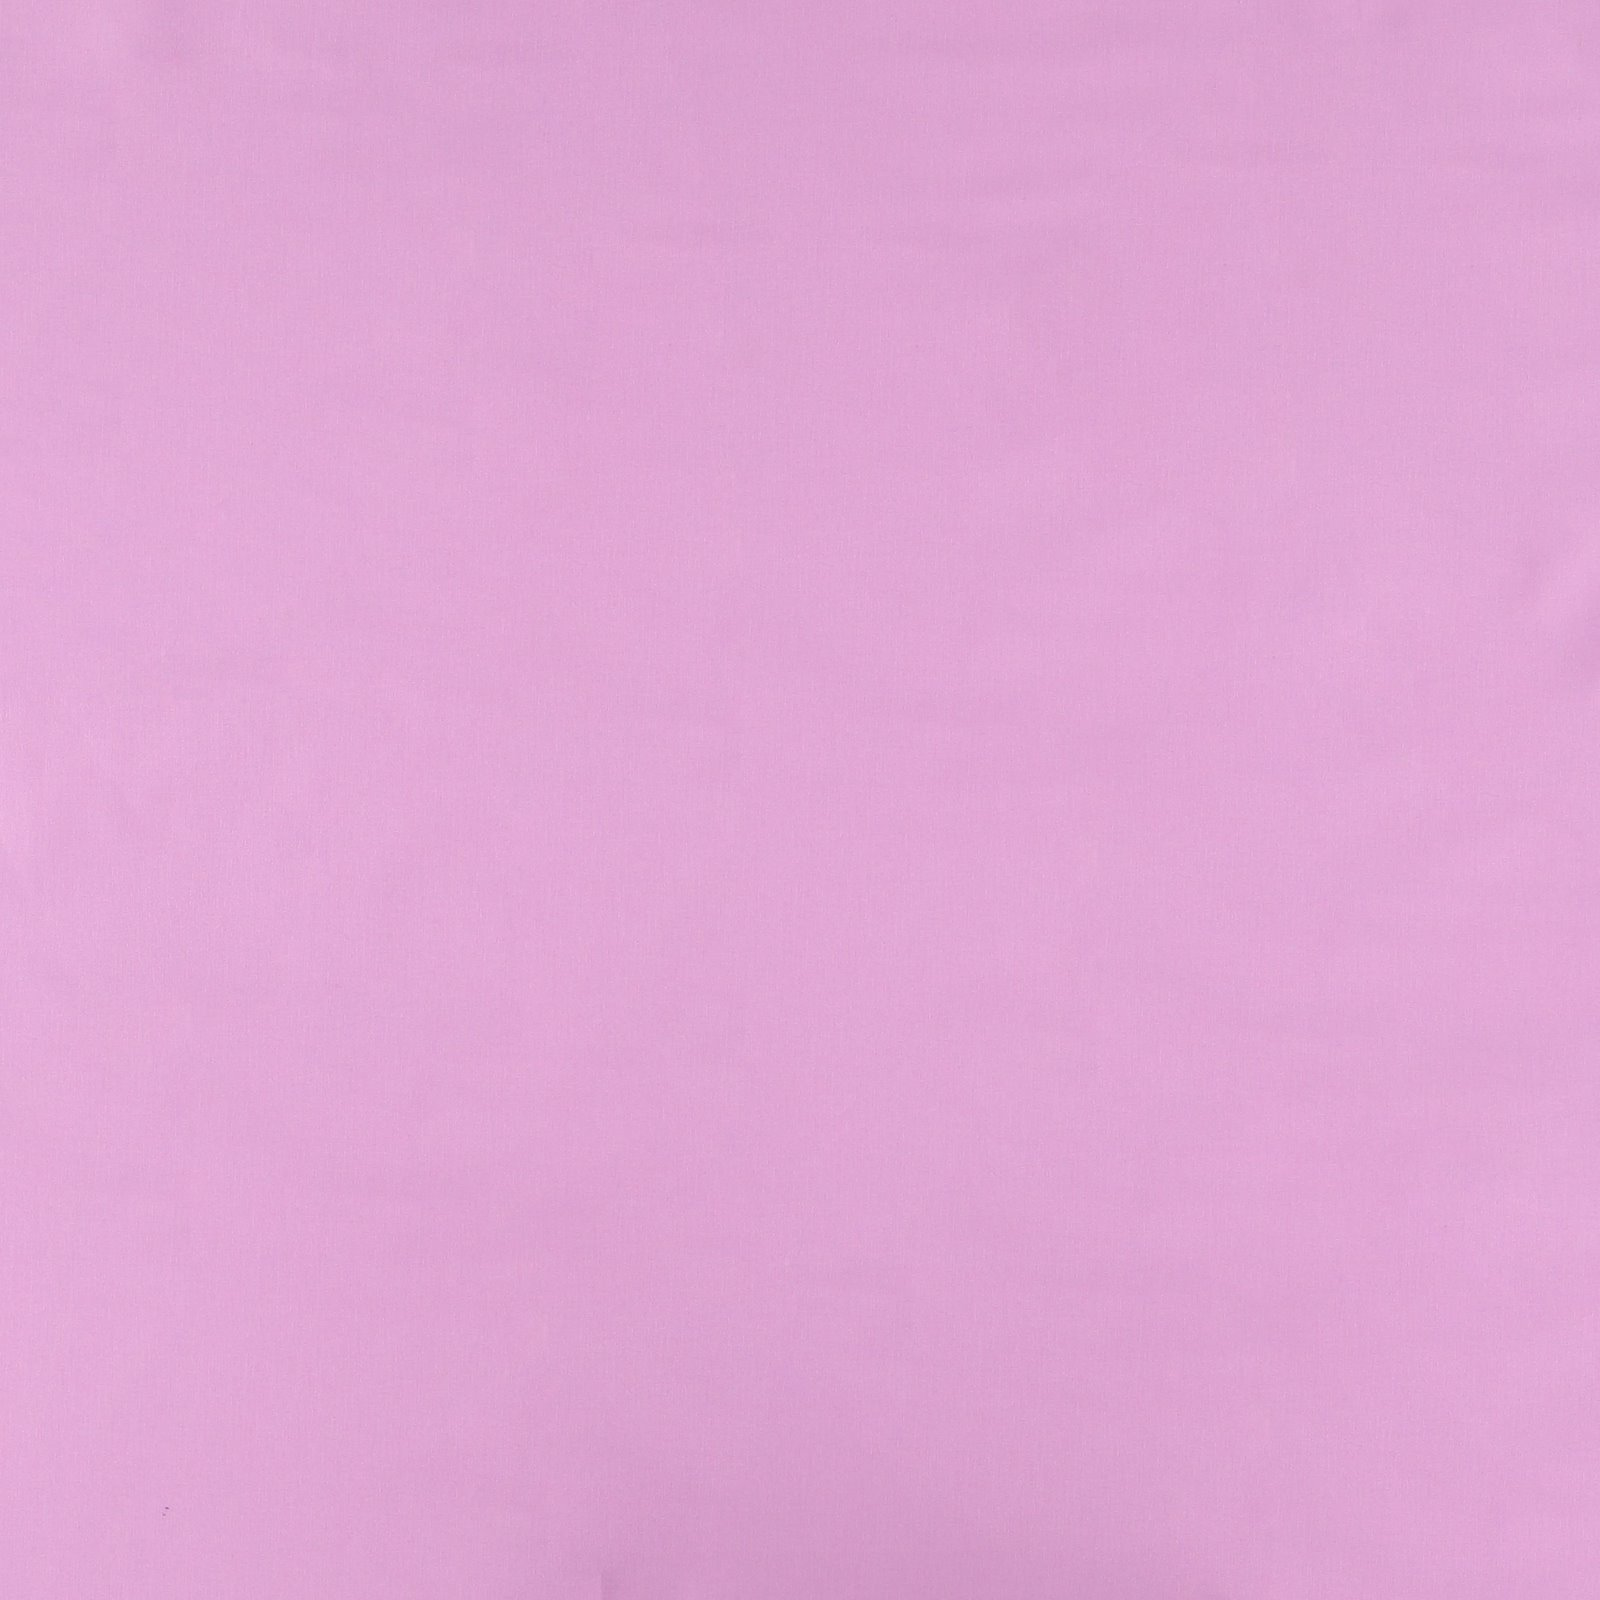 Luxury cotton light fuchsia 4355_pack_solid